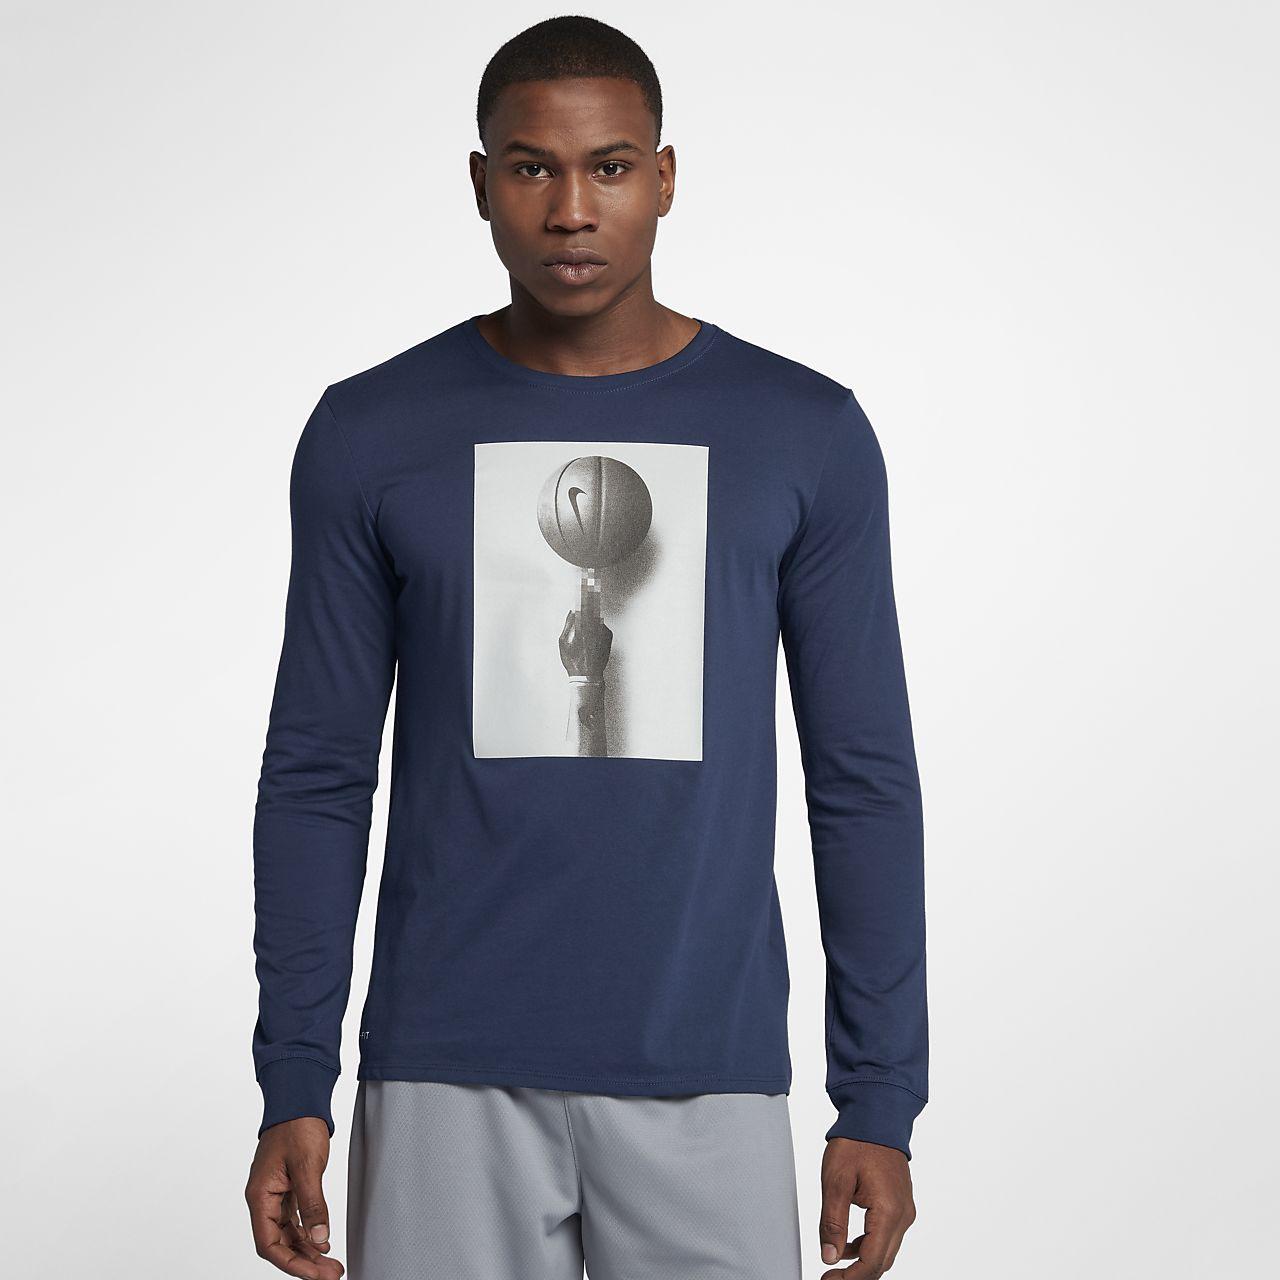 ... T-shirt da basket a manica lunga Nike Dri-FIT - Uomo